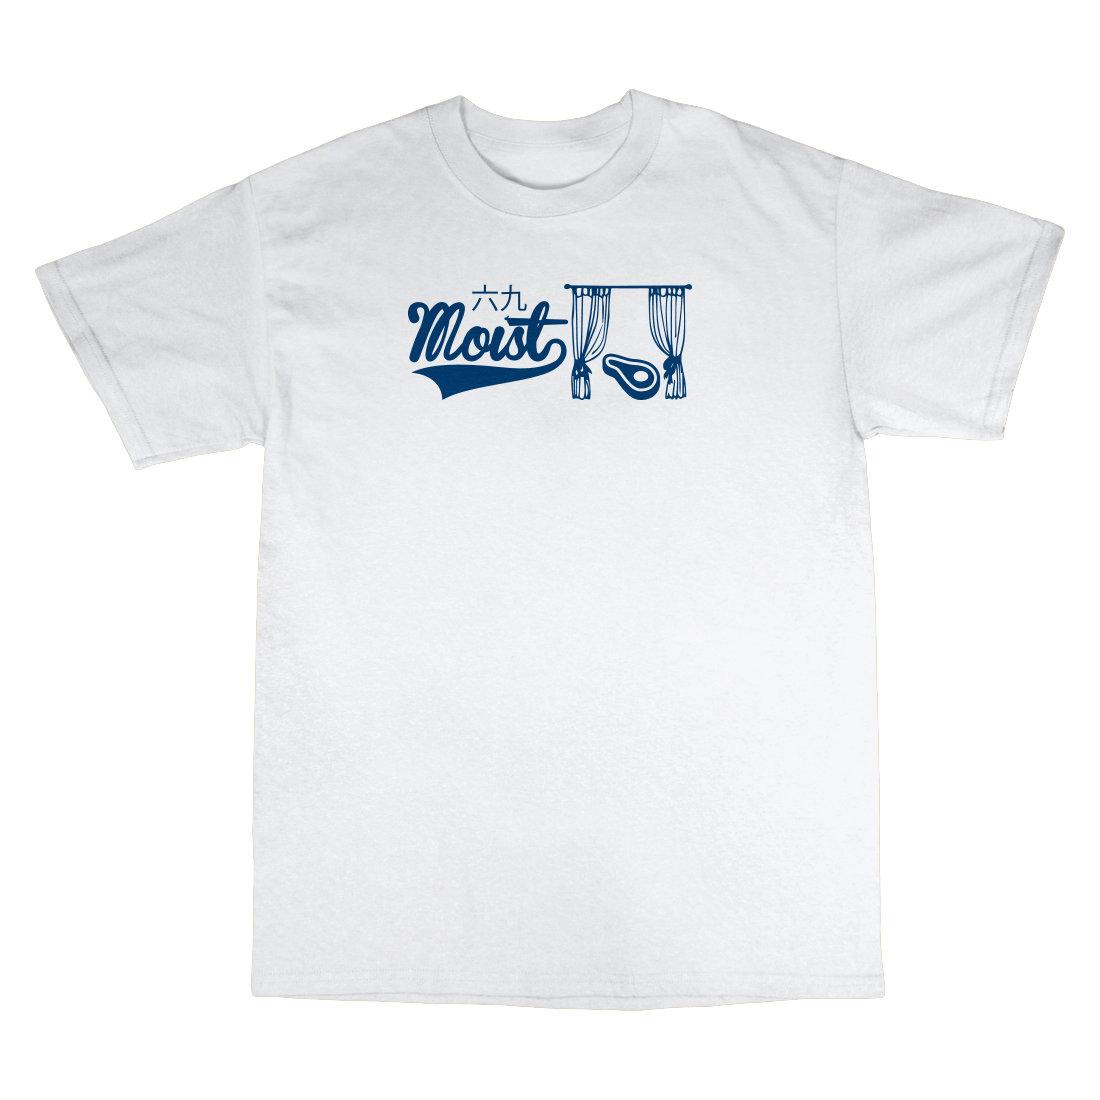 Unisex 'Beef Curtains' T-Shirt MALEBeefCurtainsTee